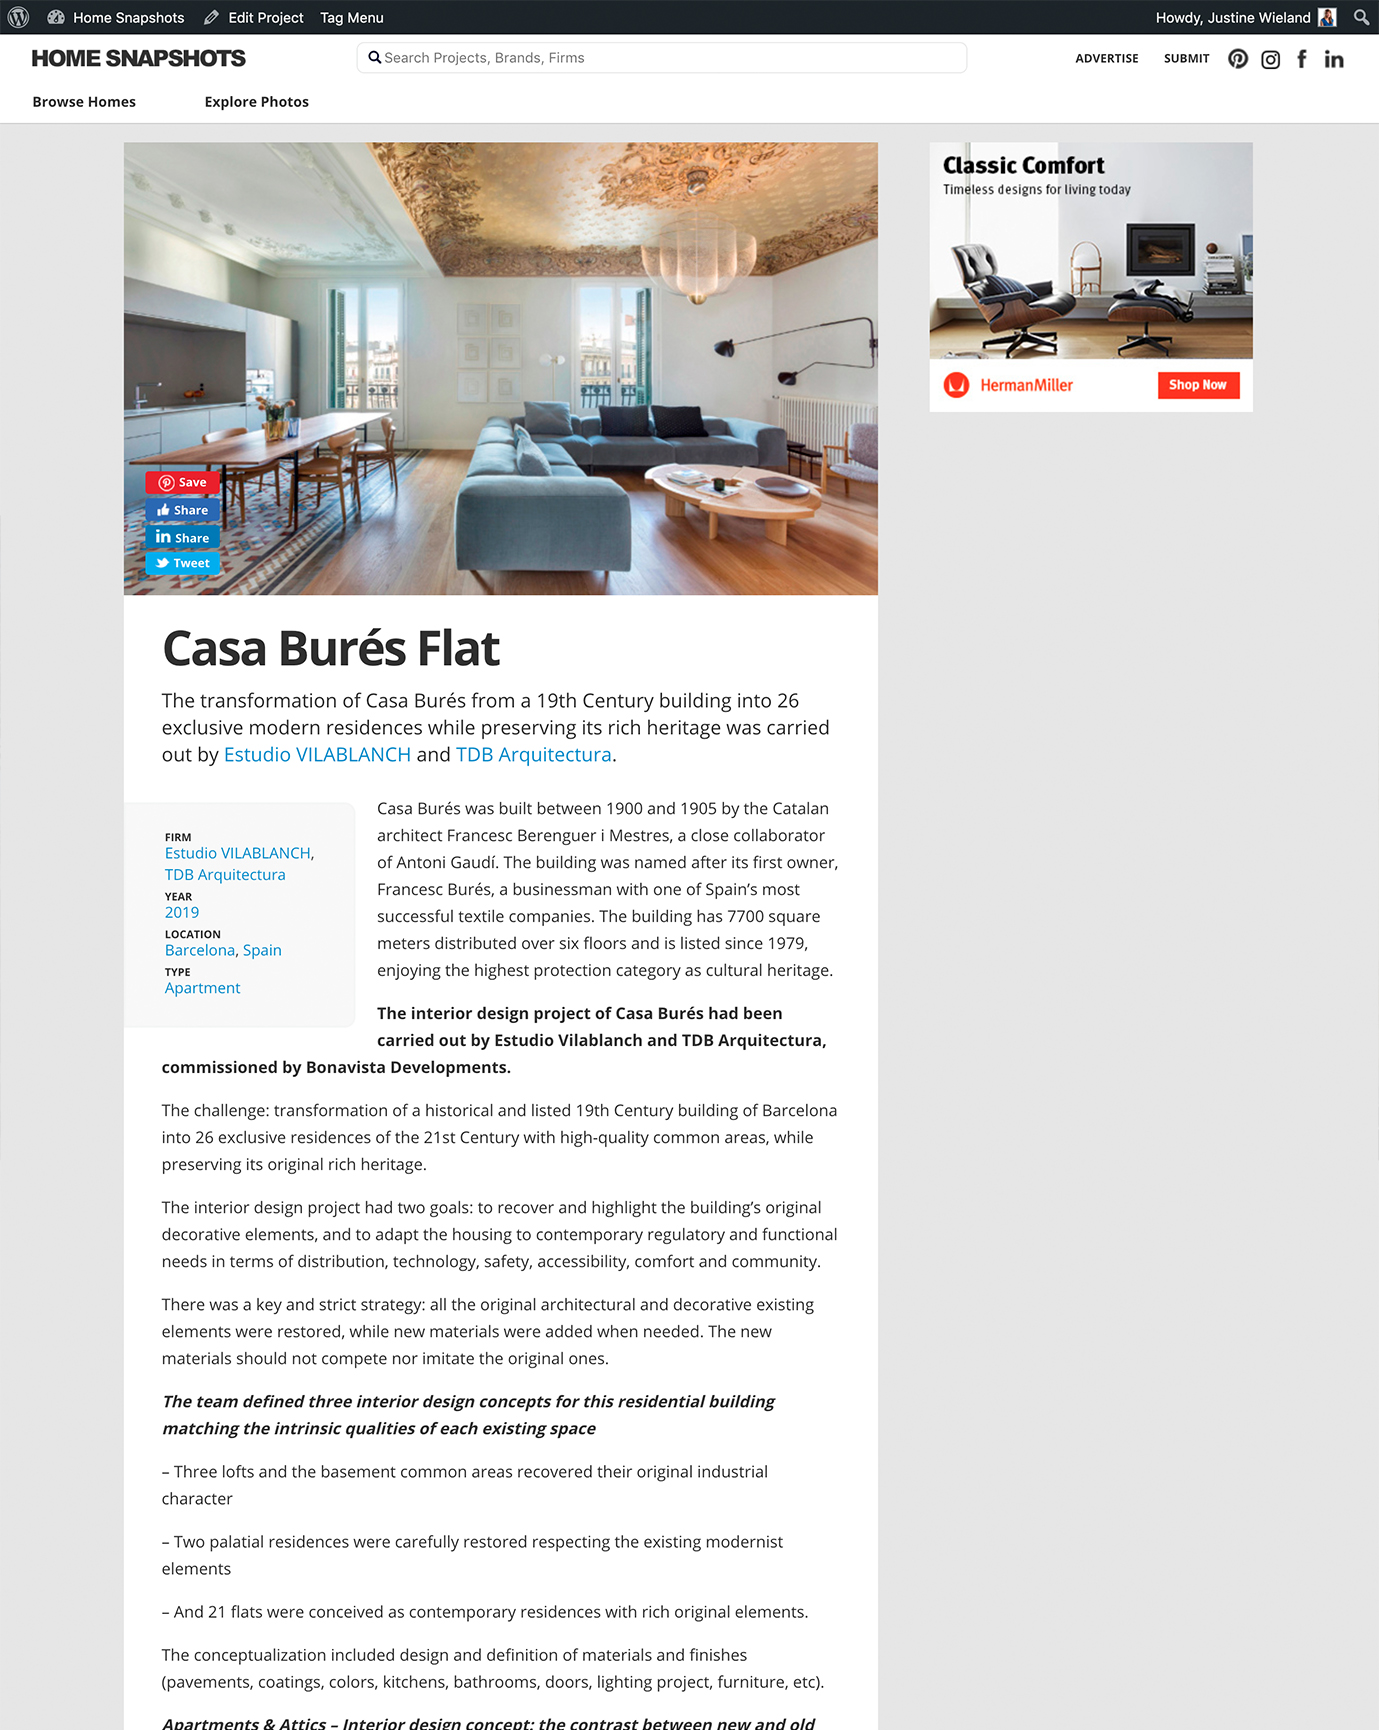 Home Snapshots · Casa Burés · Mayo 2020